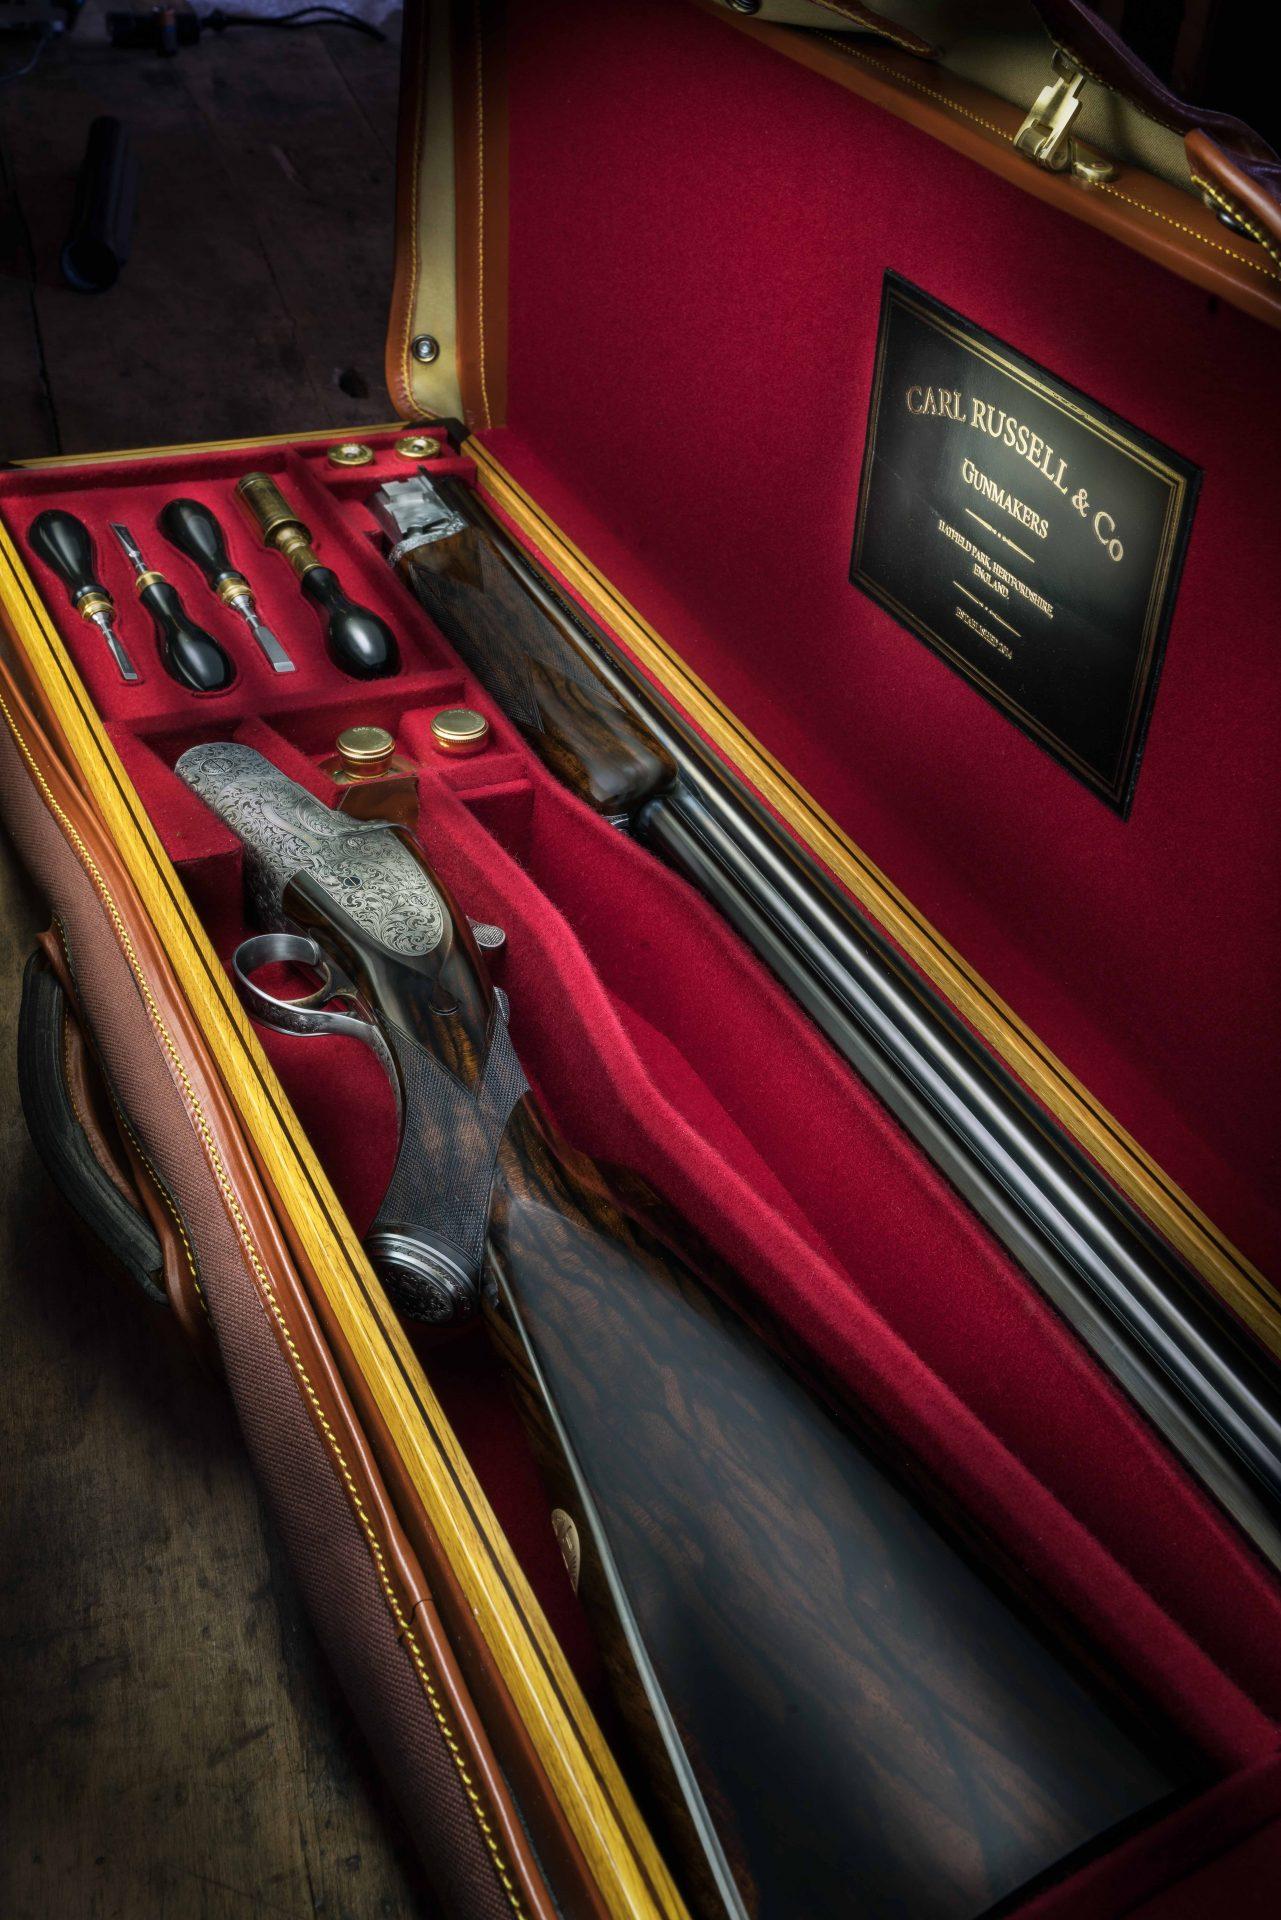 Shotgun in oak and leather case